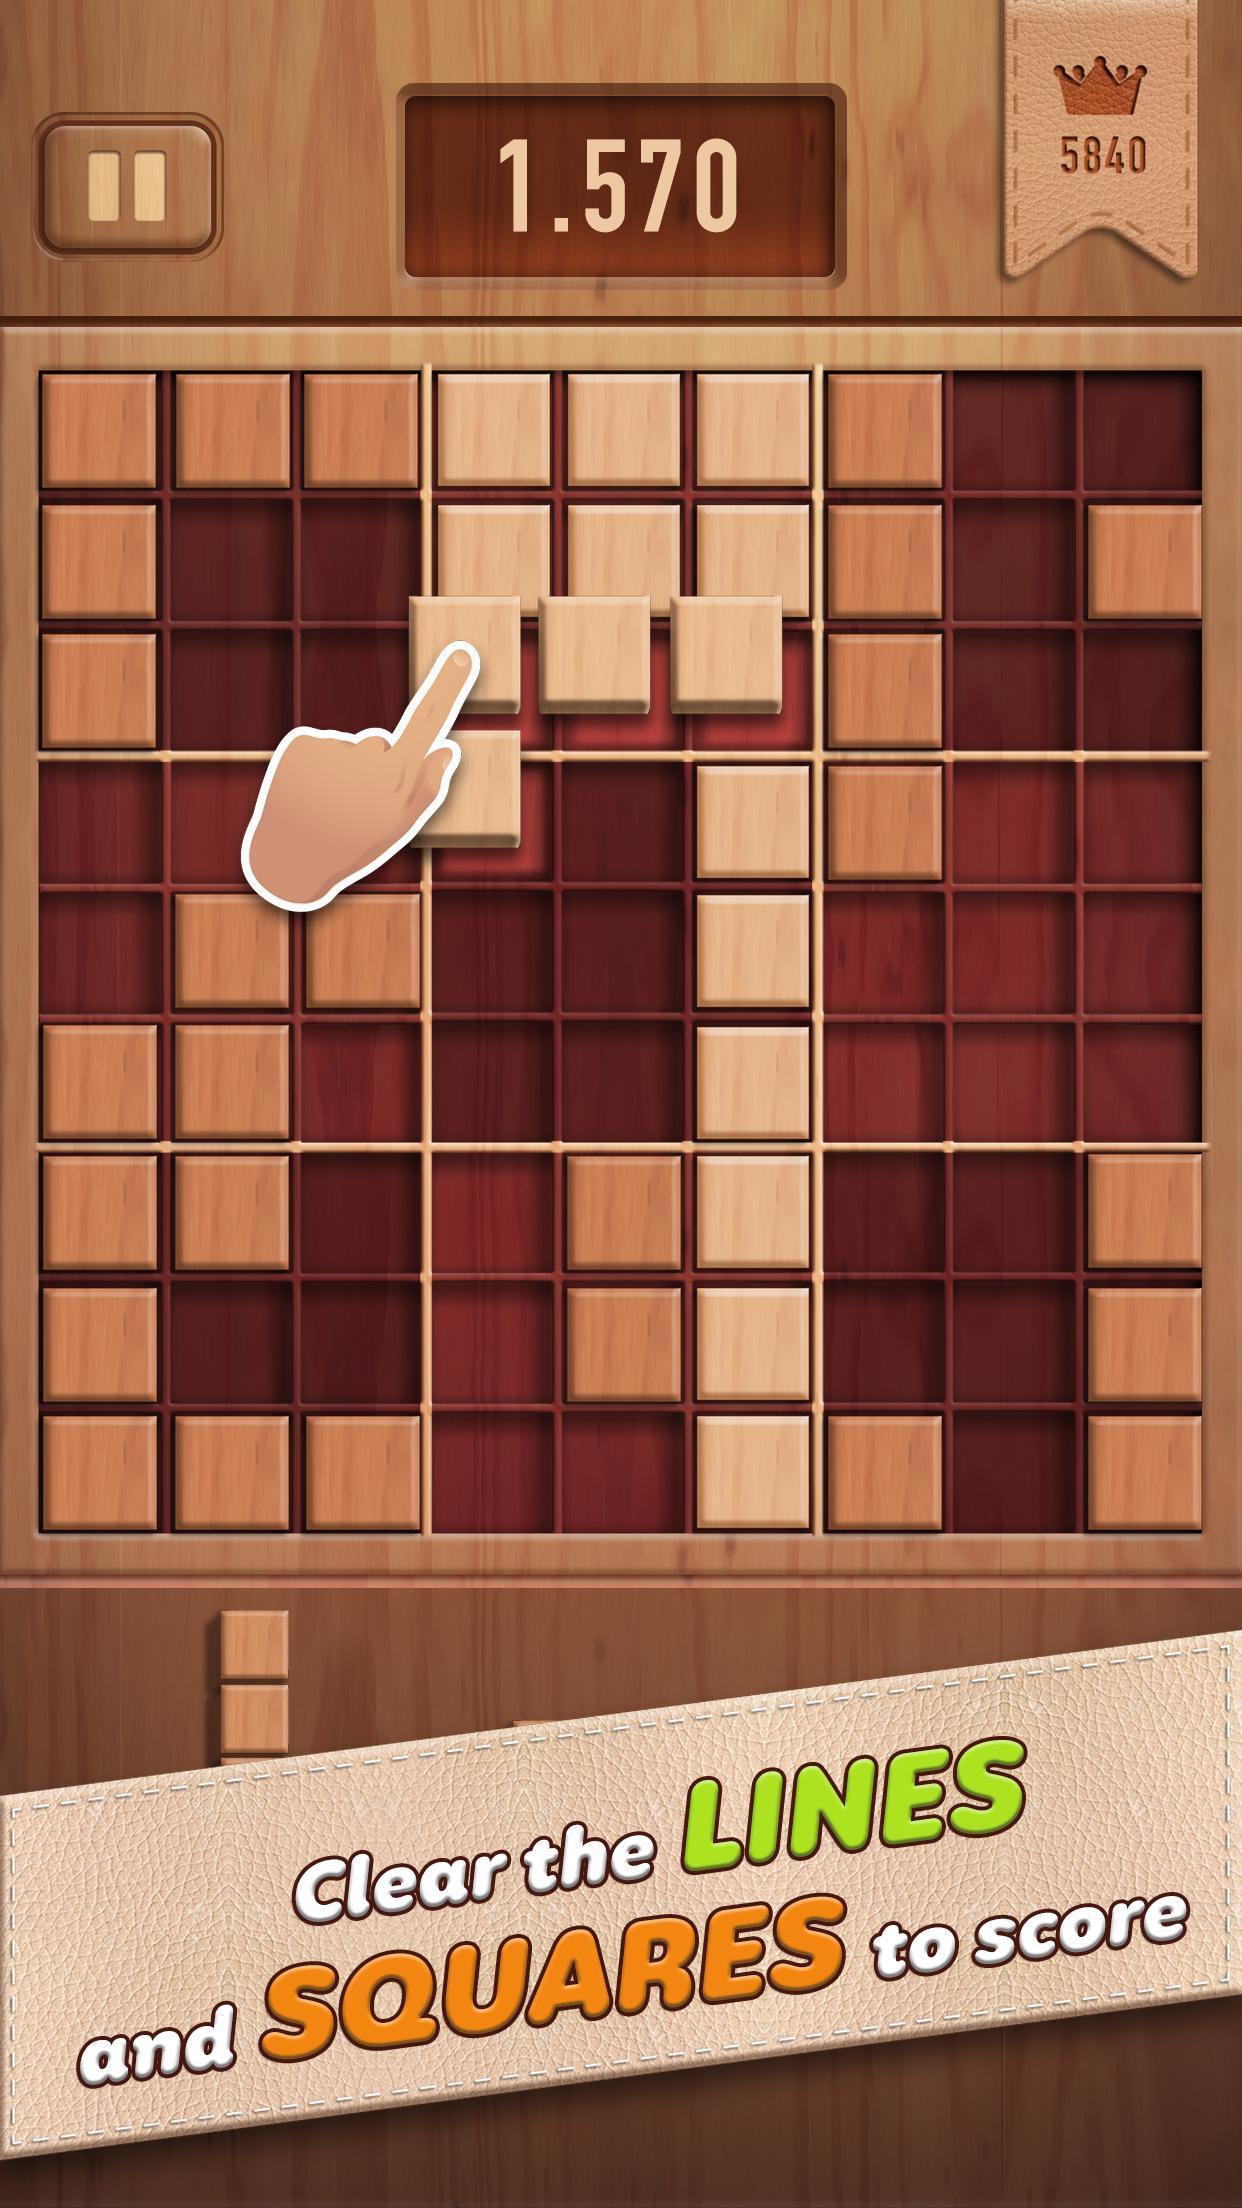 Woody 99 Sudoku Block Puzzle - Free Mind Games 1.2.2 Screenshot 1